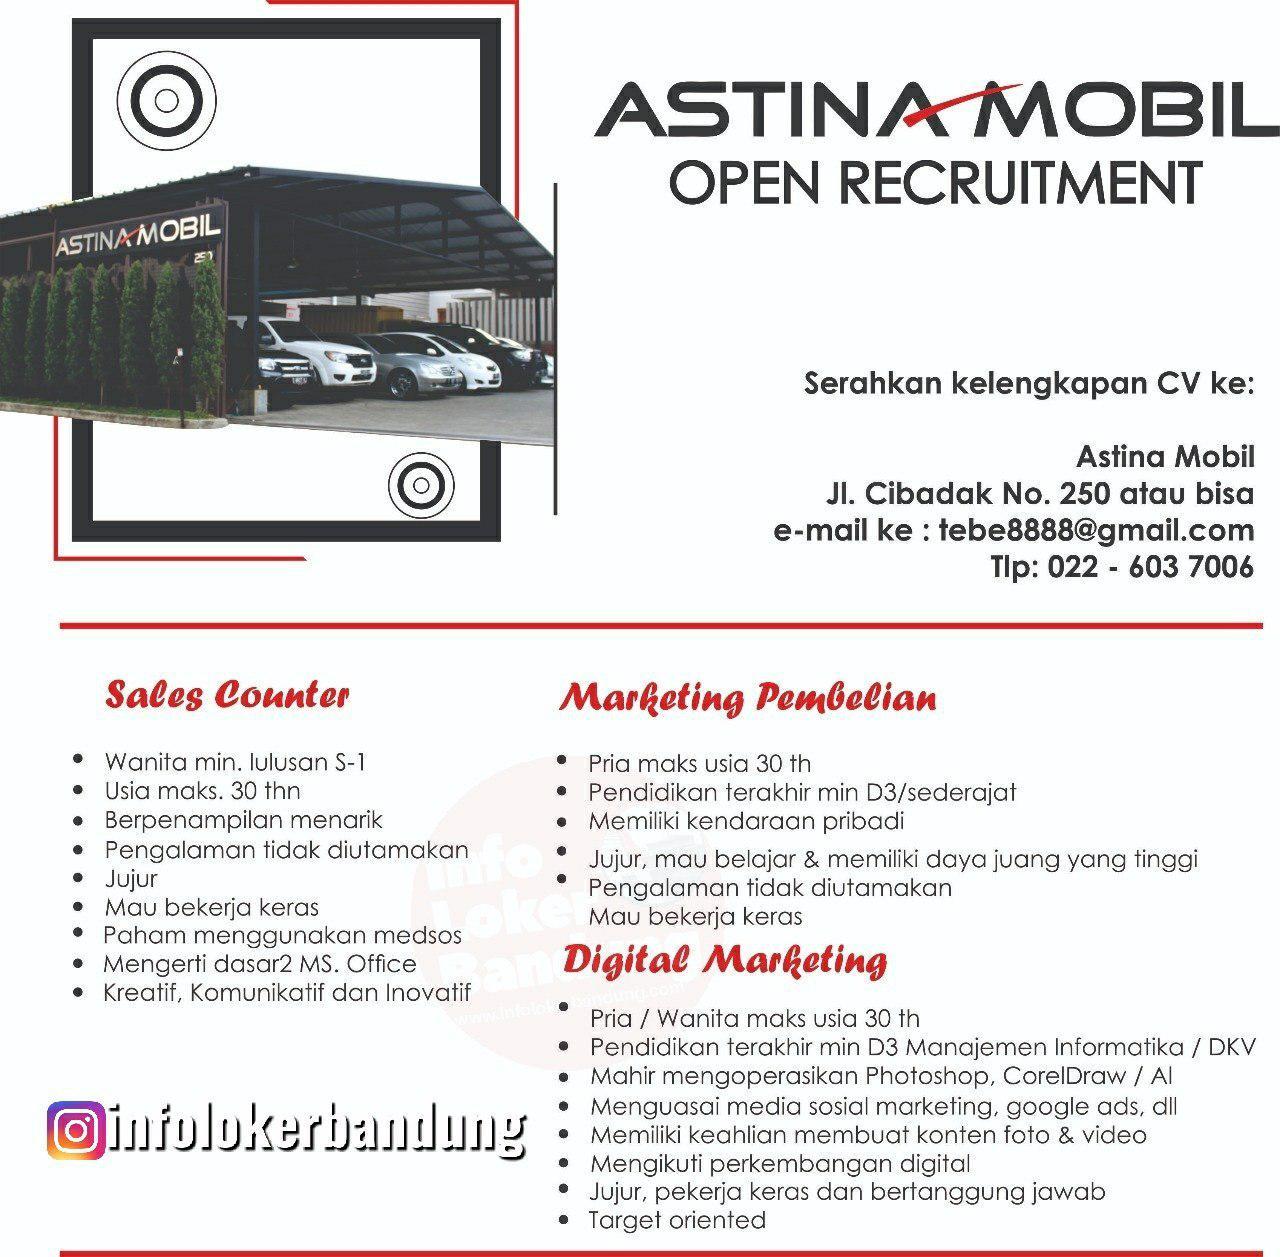 Lowongan Kerja Astina Mobil Bandung April 2019